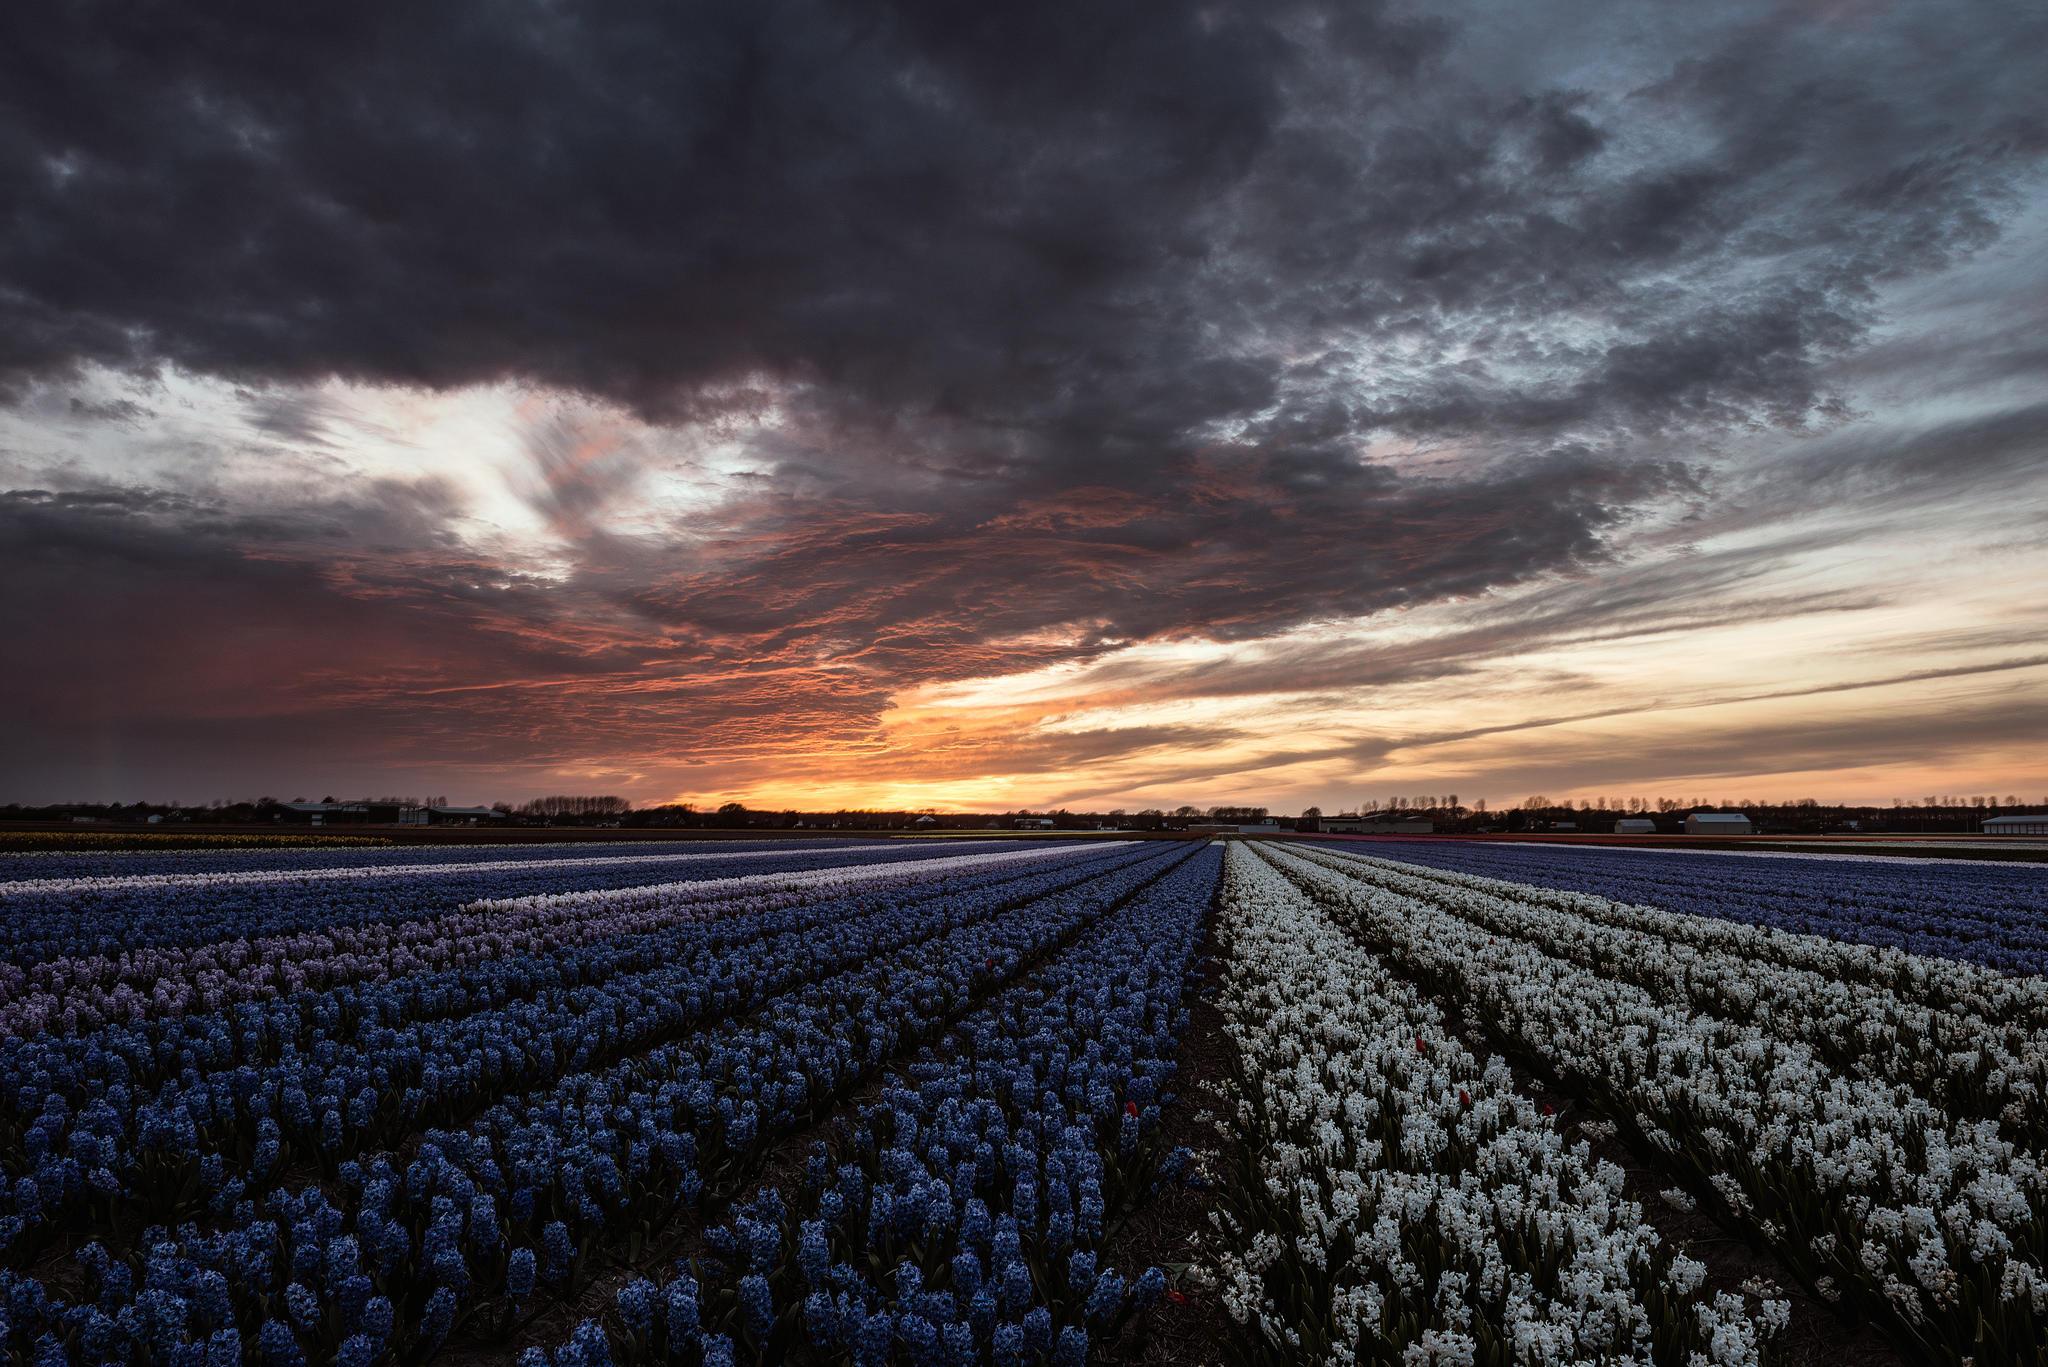 Lisse-Netherlands, Лиссе, Нидерланды закат